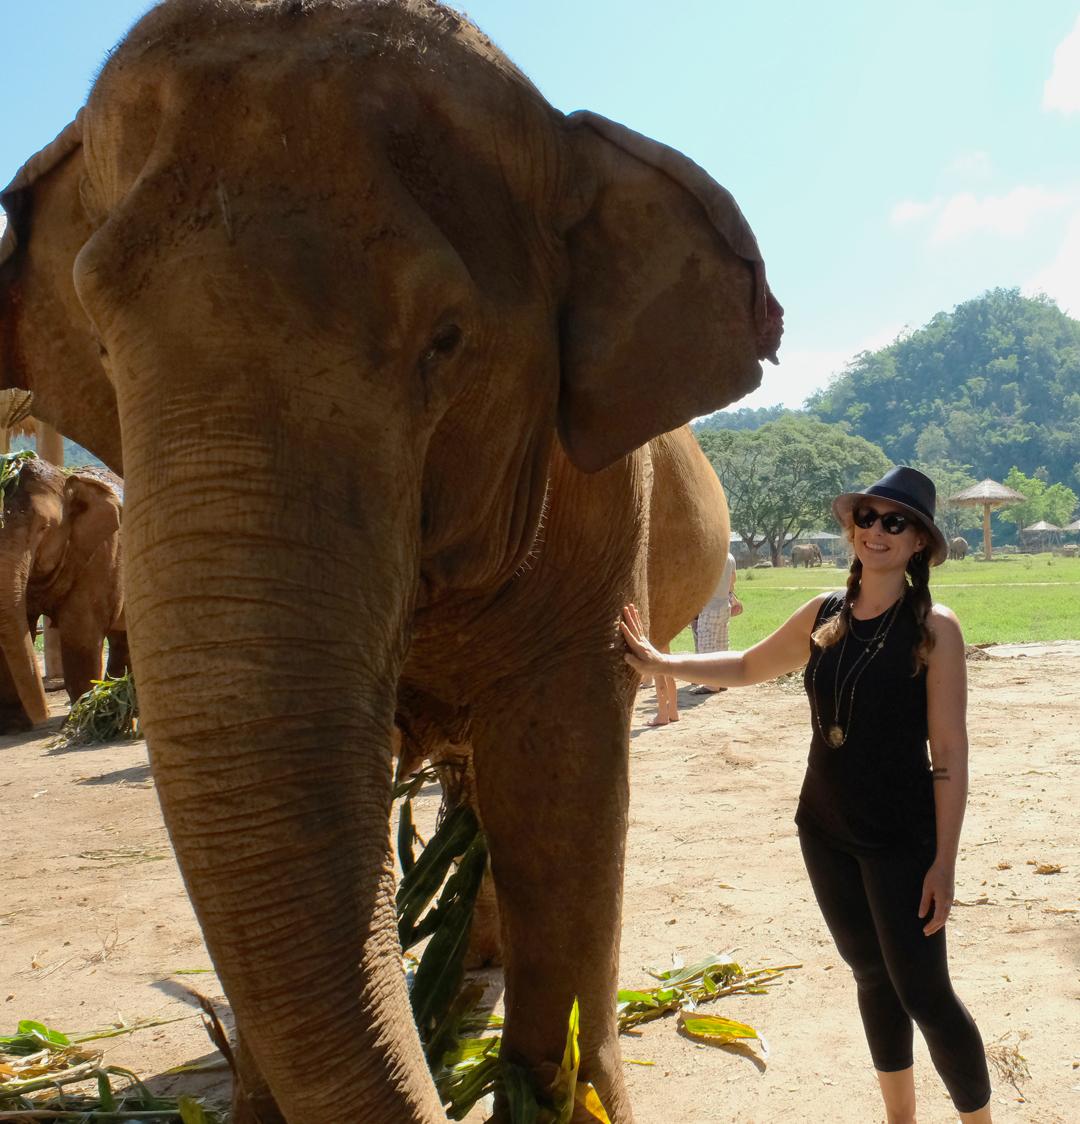 Linden in Thailand   photo: @sfreneenyc for Pravassa